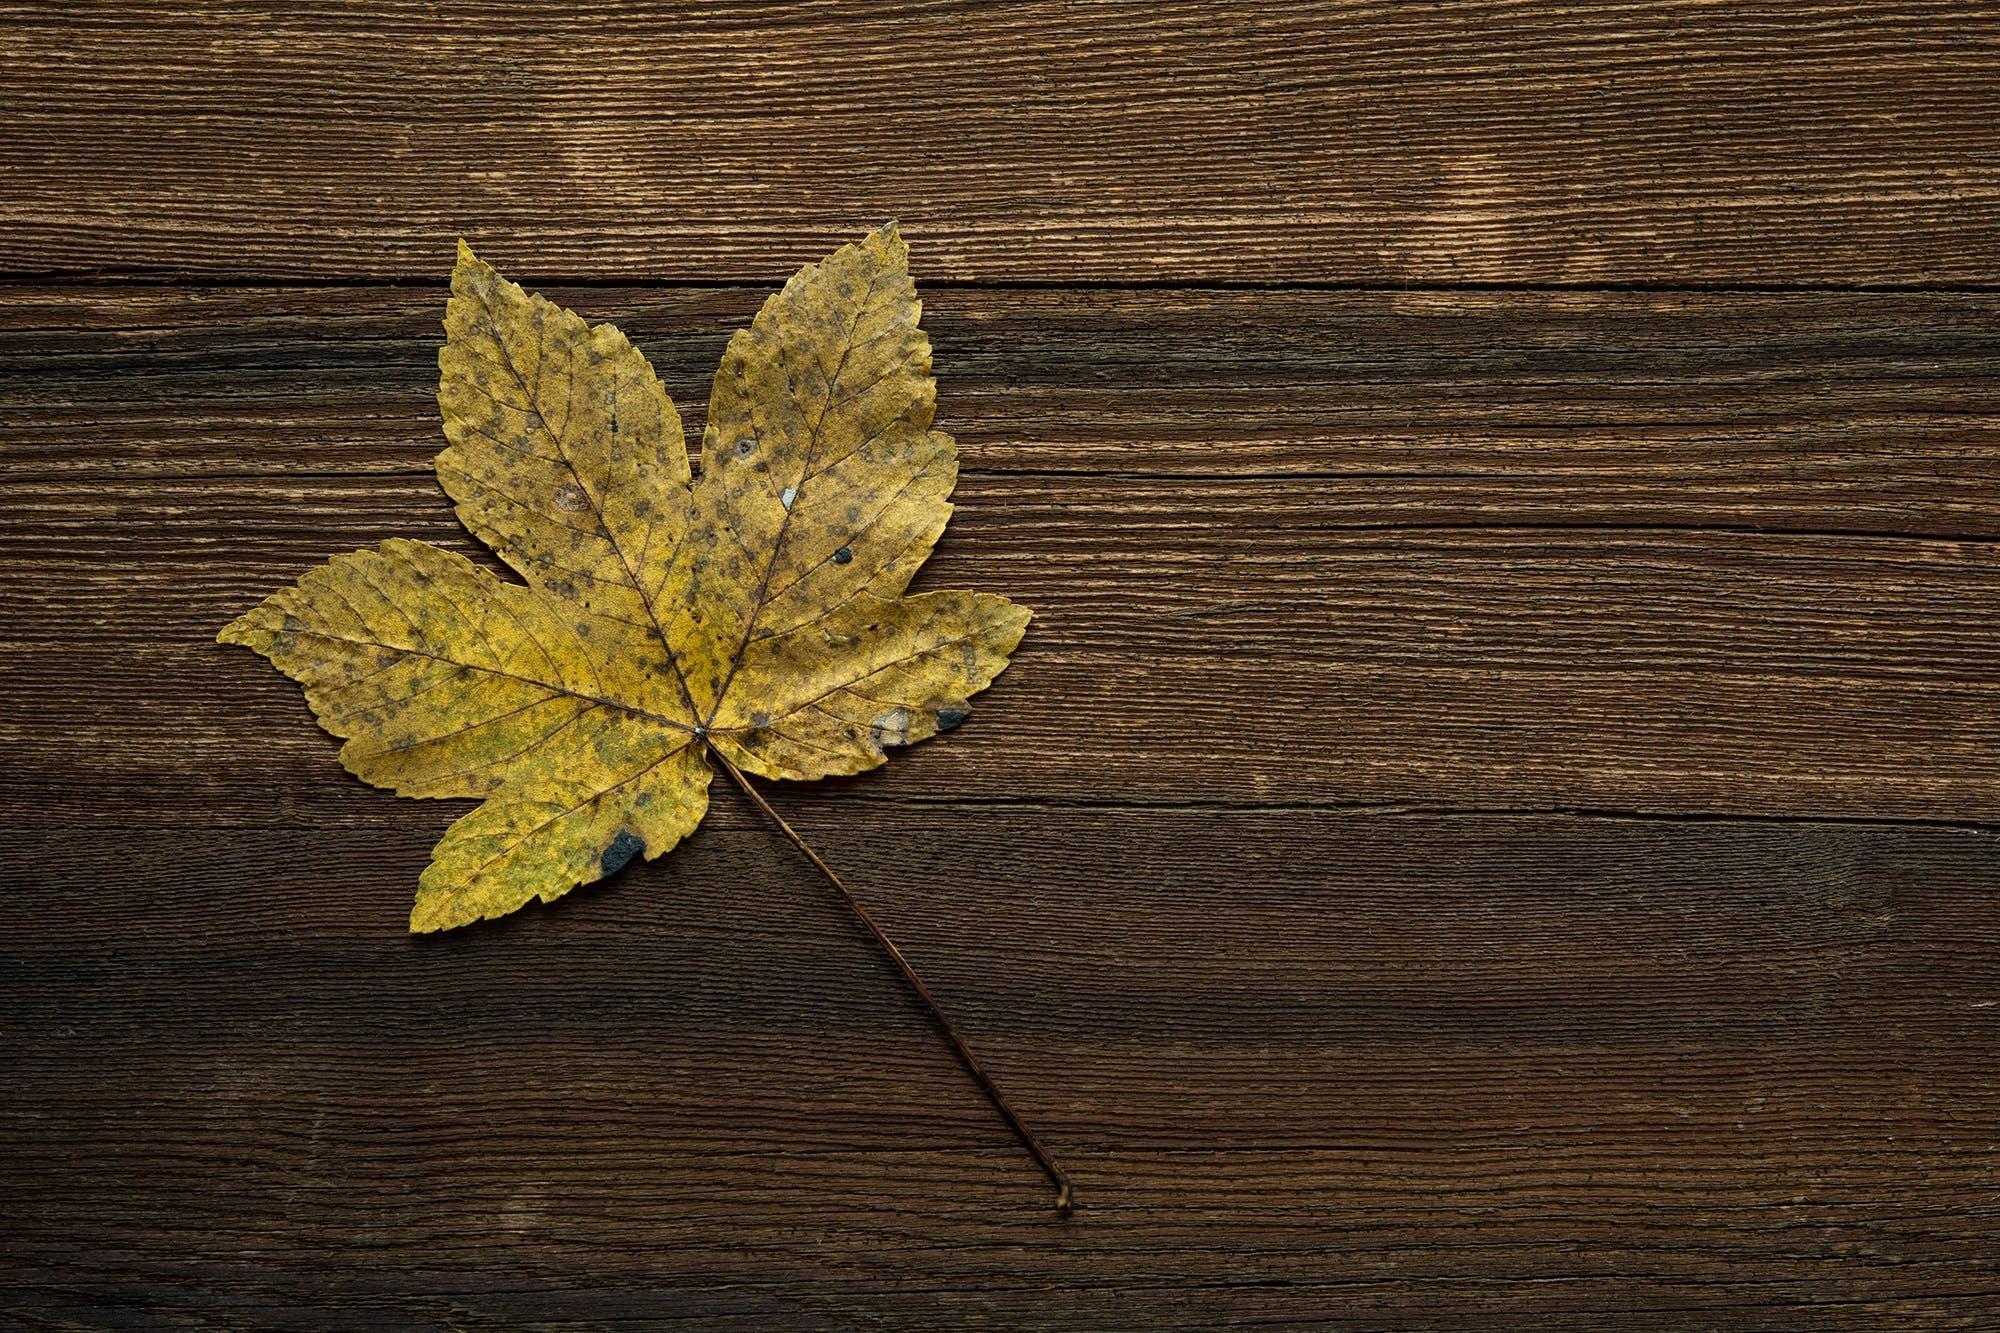 Brown Leaf on Brown Wooden Surface